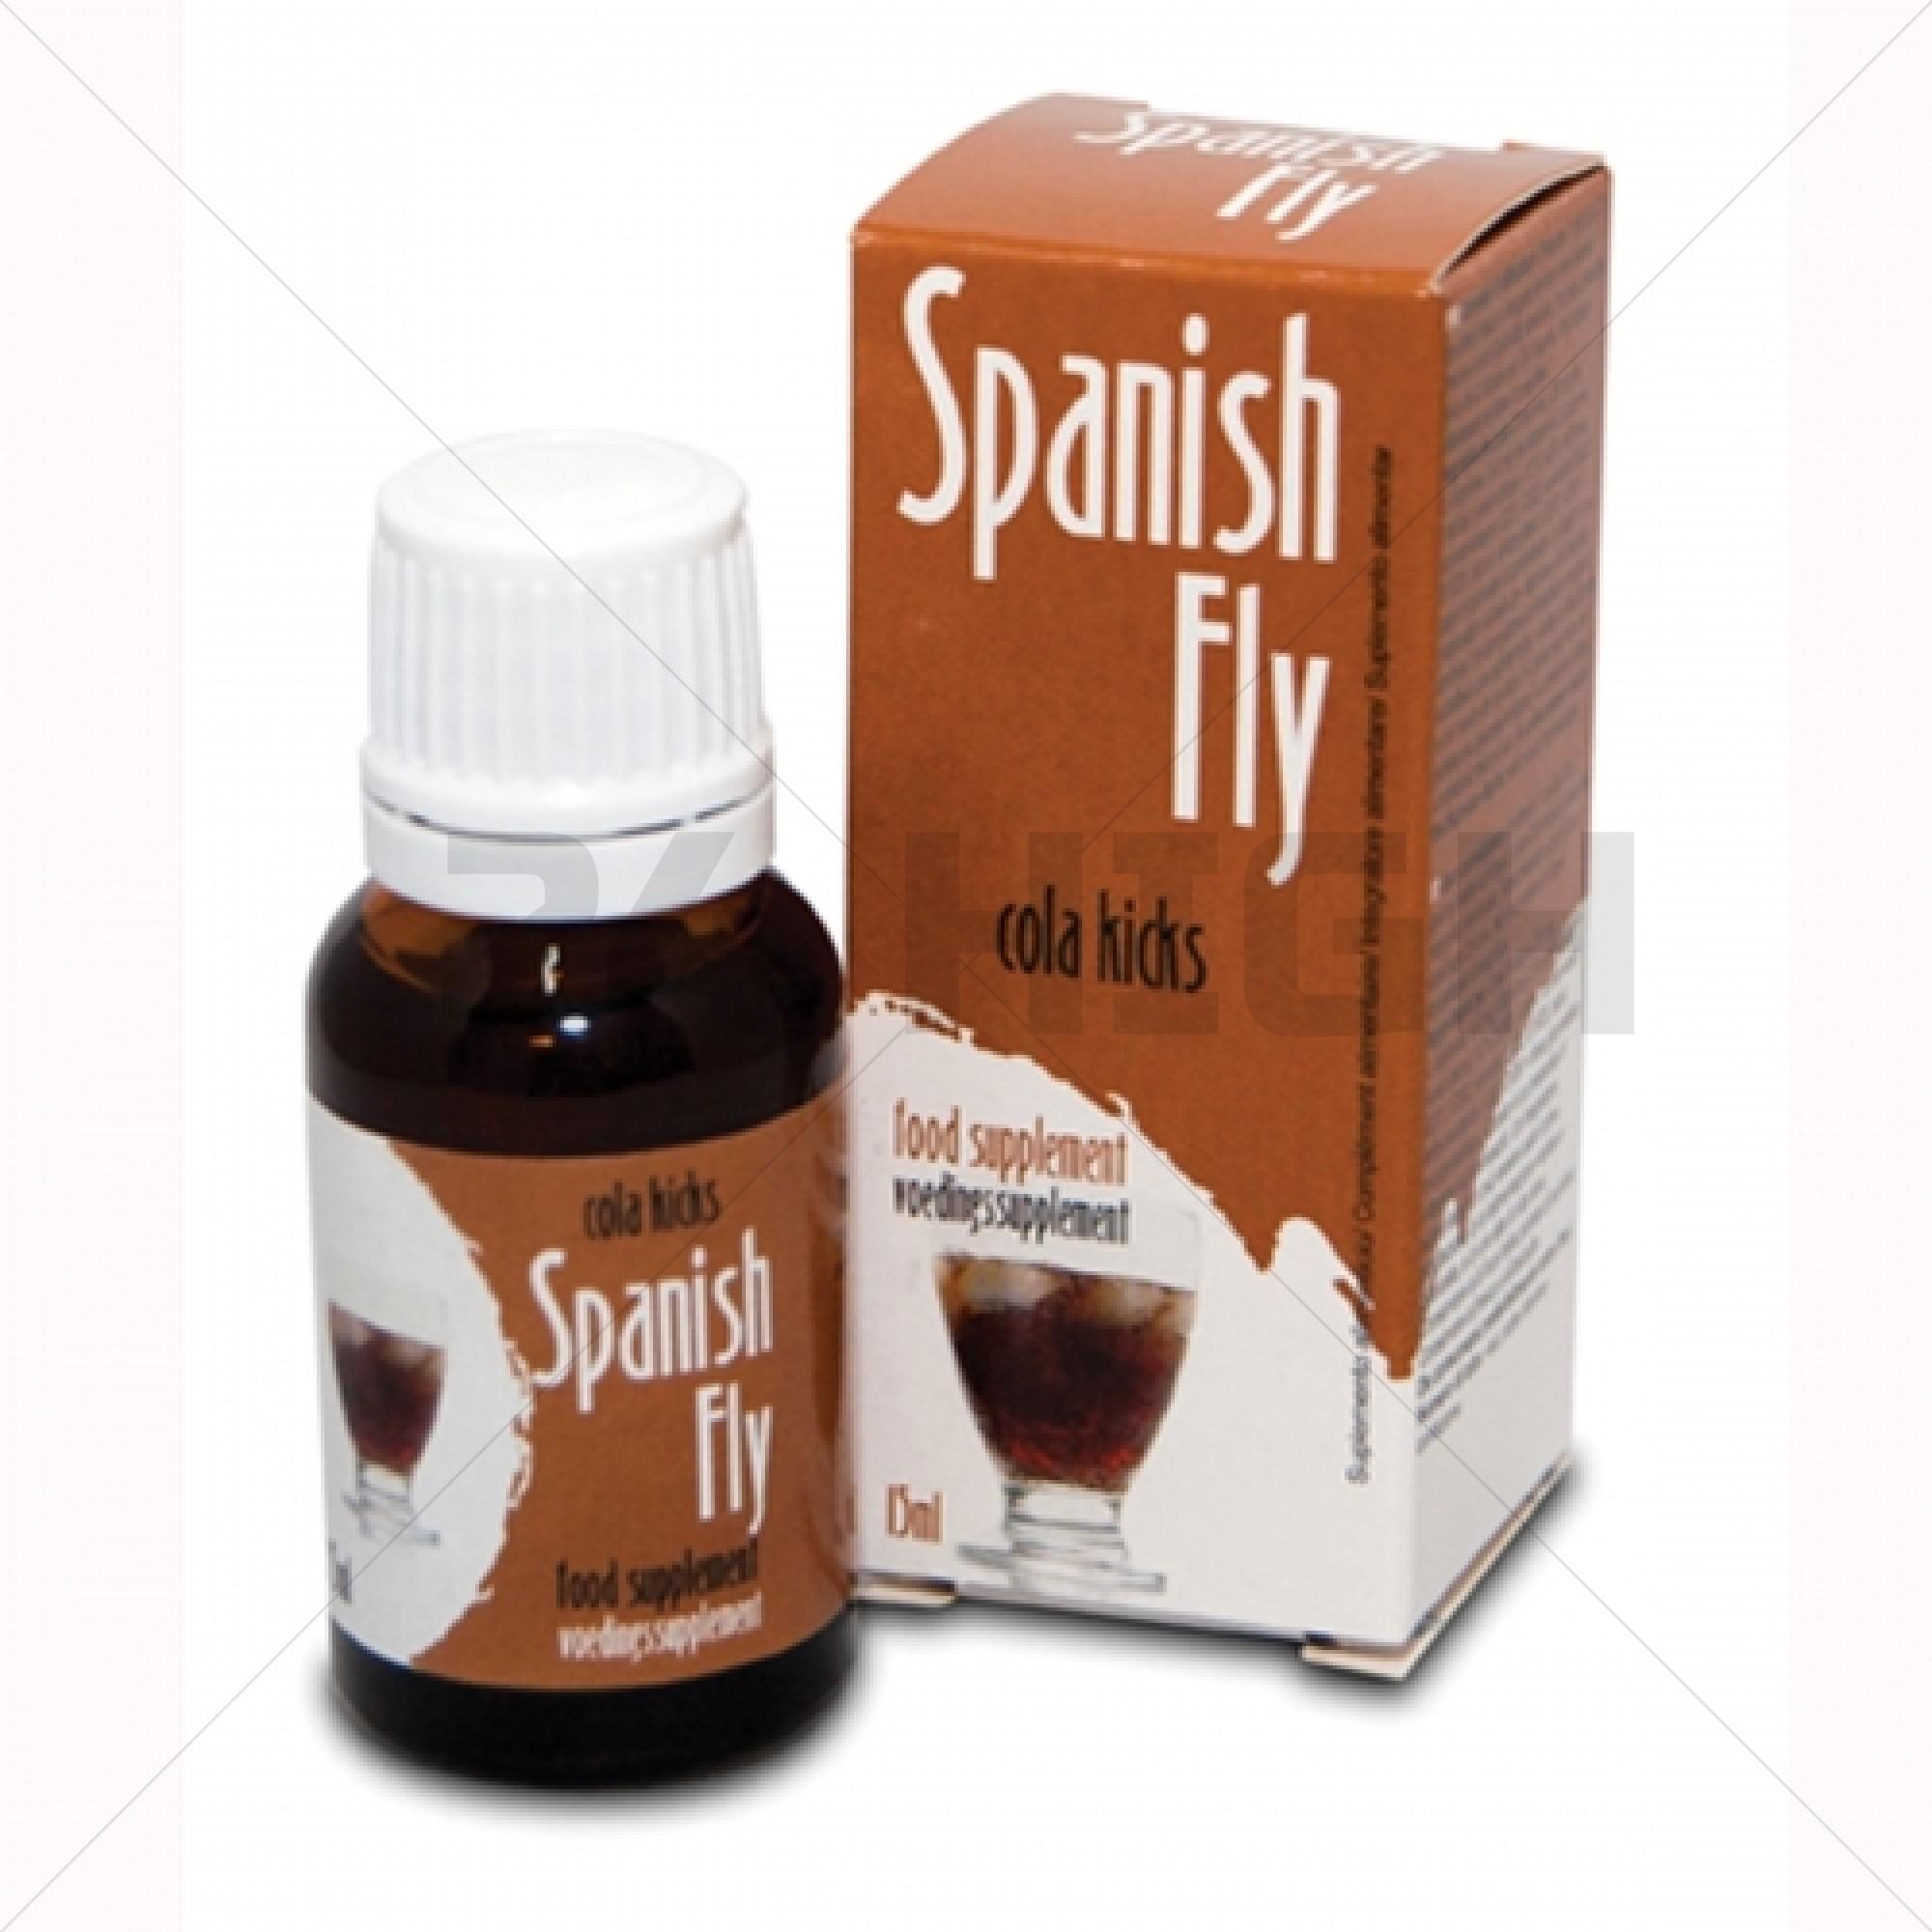 Spanish Fly Cola Kicks - 15 ml